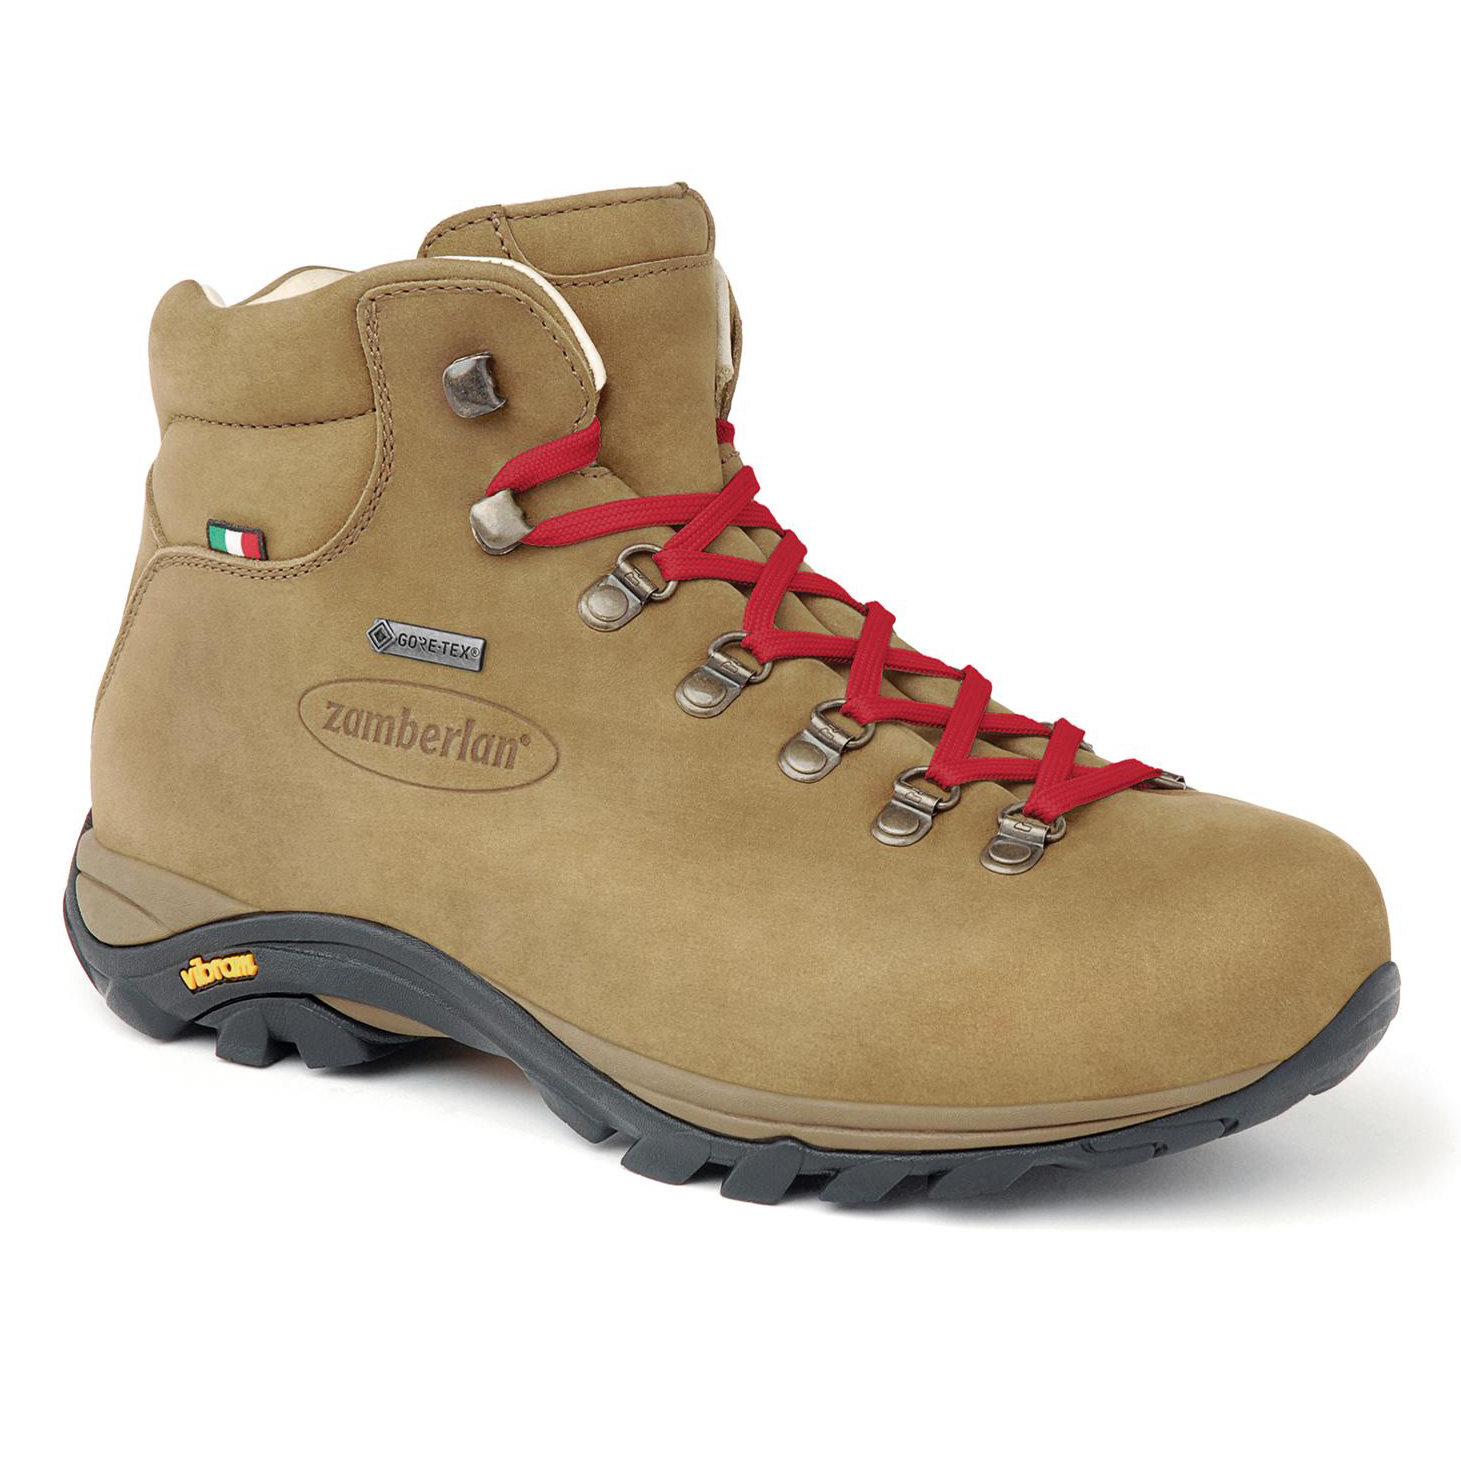 Zamberlan Trail Lite Evo Walking Boots UK 6.5 Dark Brown